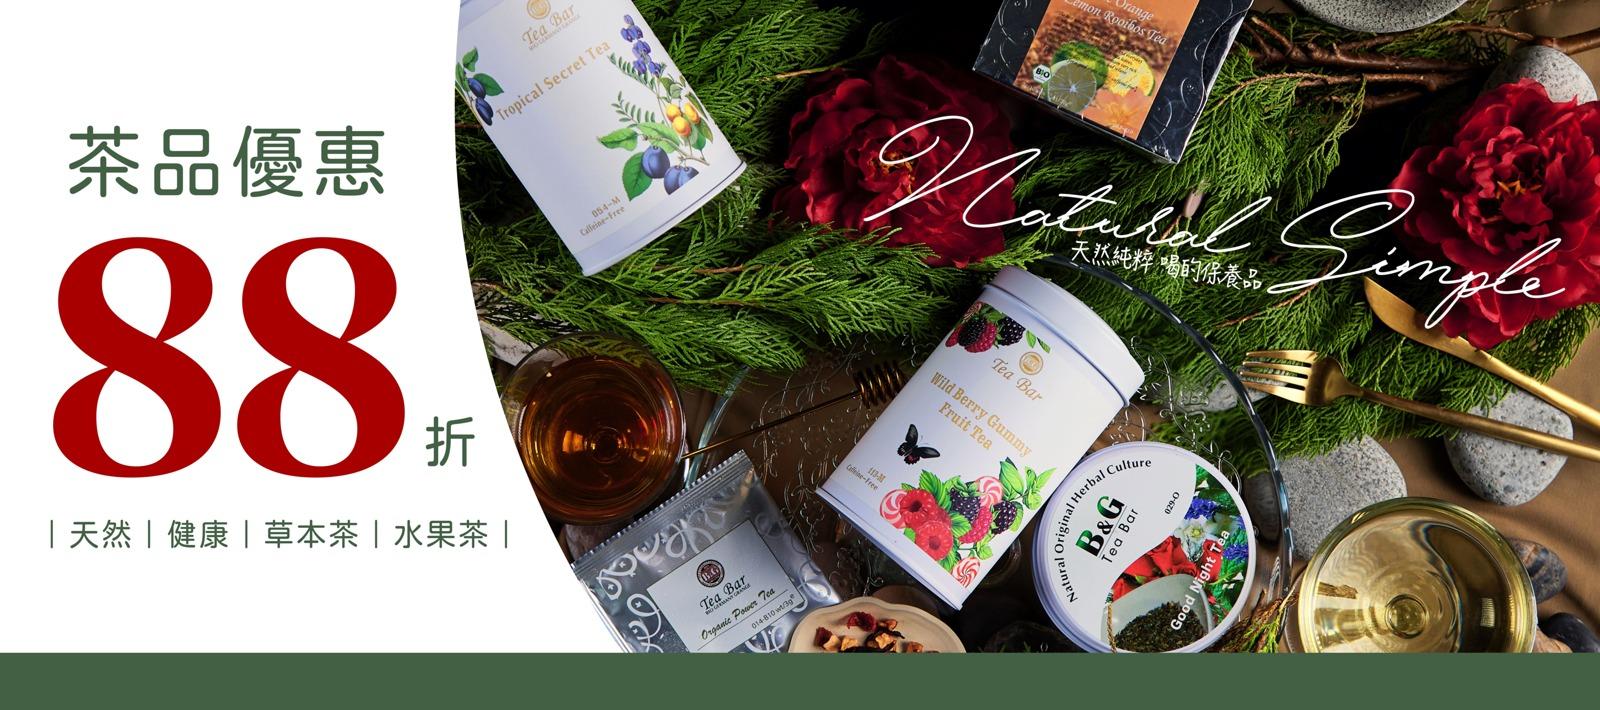 【B&G德國農莊】好喝Tea Bar有機天然草本水果茶|2021團購優惠 @GINA環球旅行生活